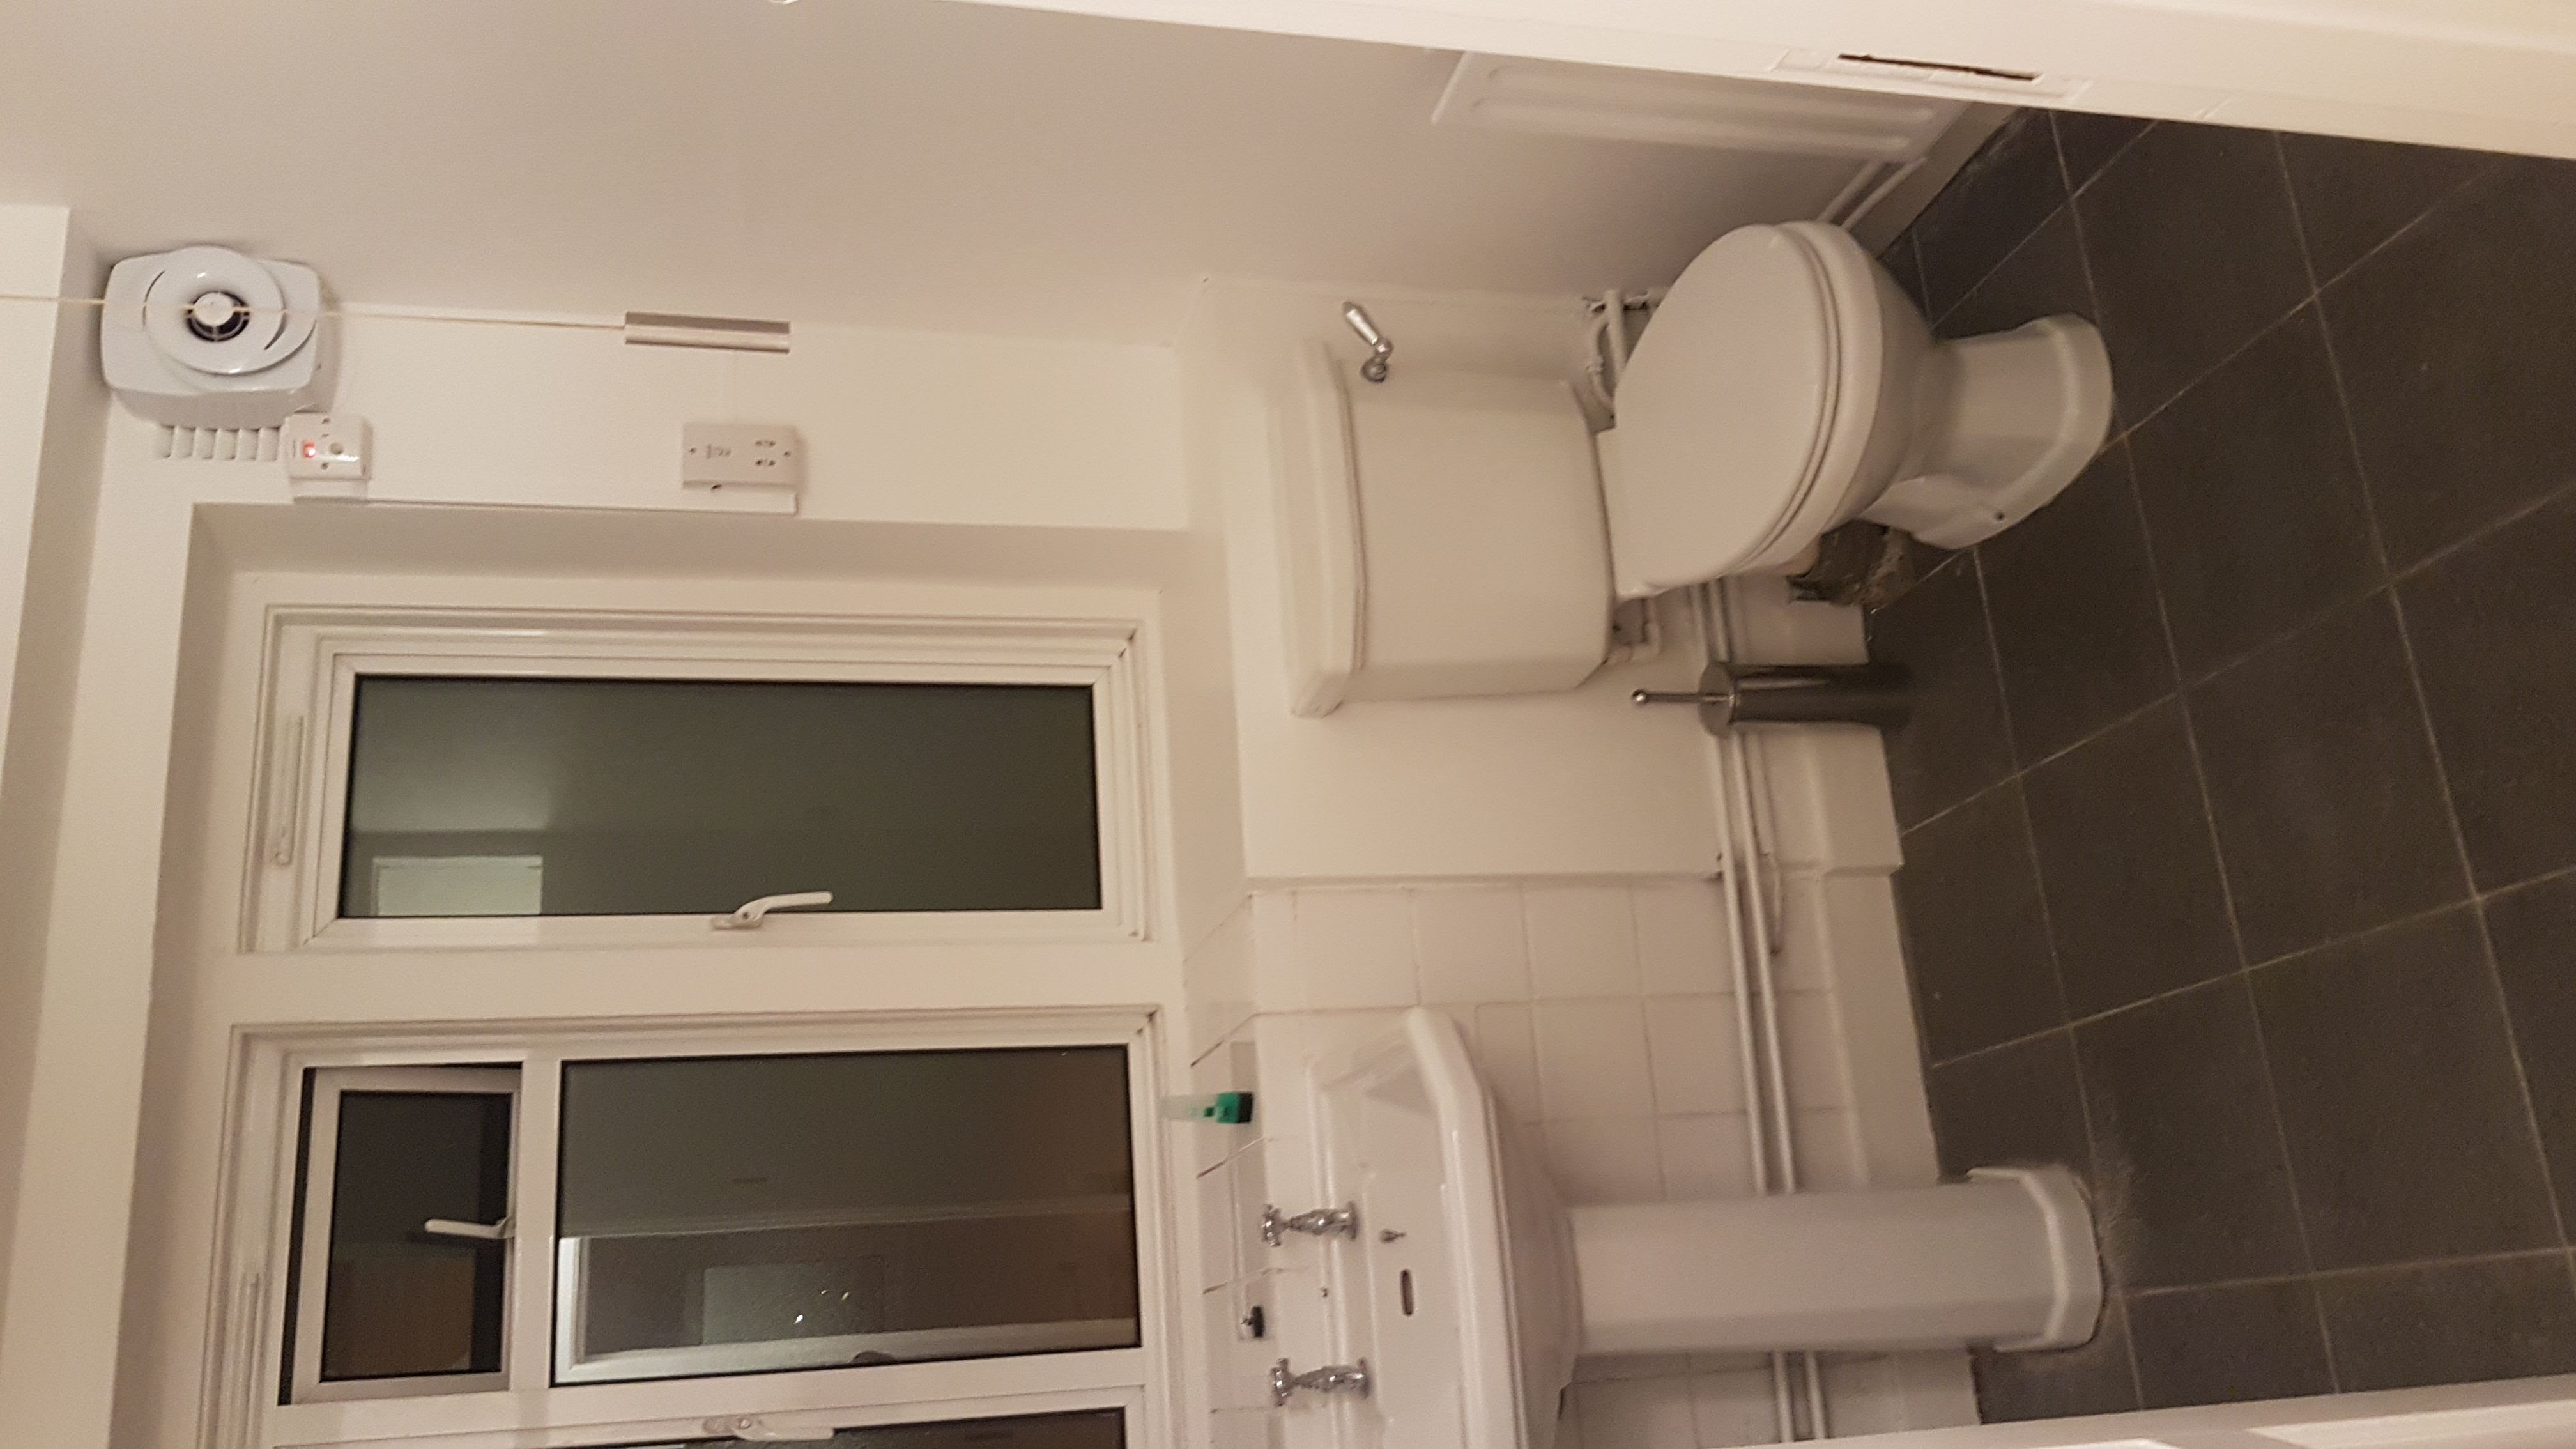 Initial bathroom